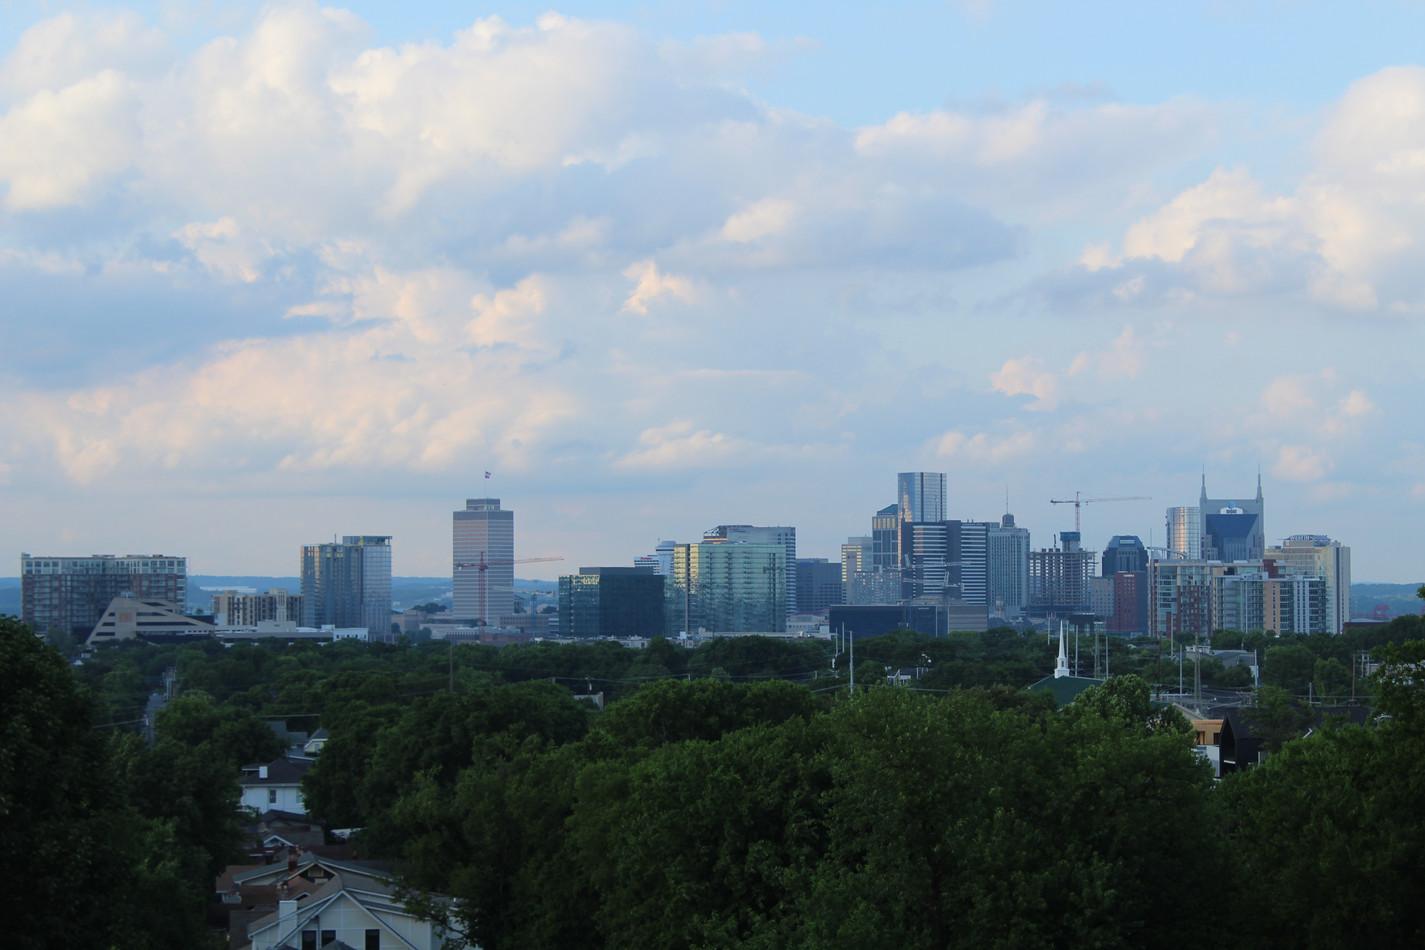 Nashville Skyline 2019 from Belmont